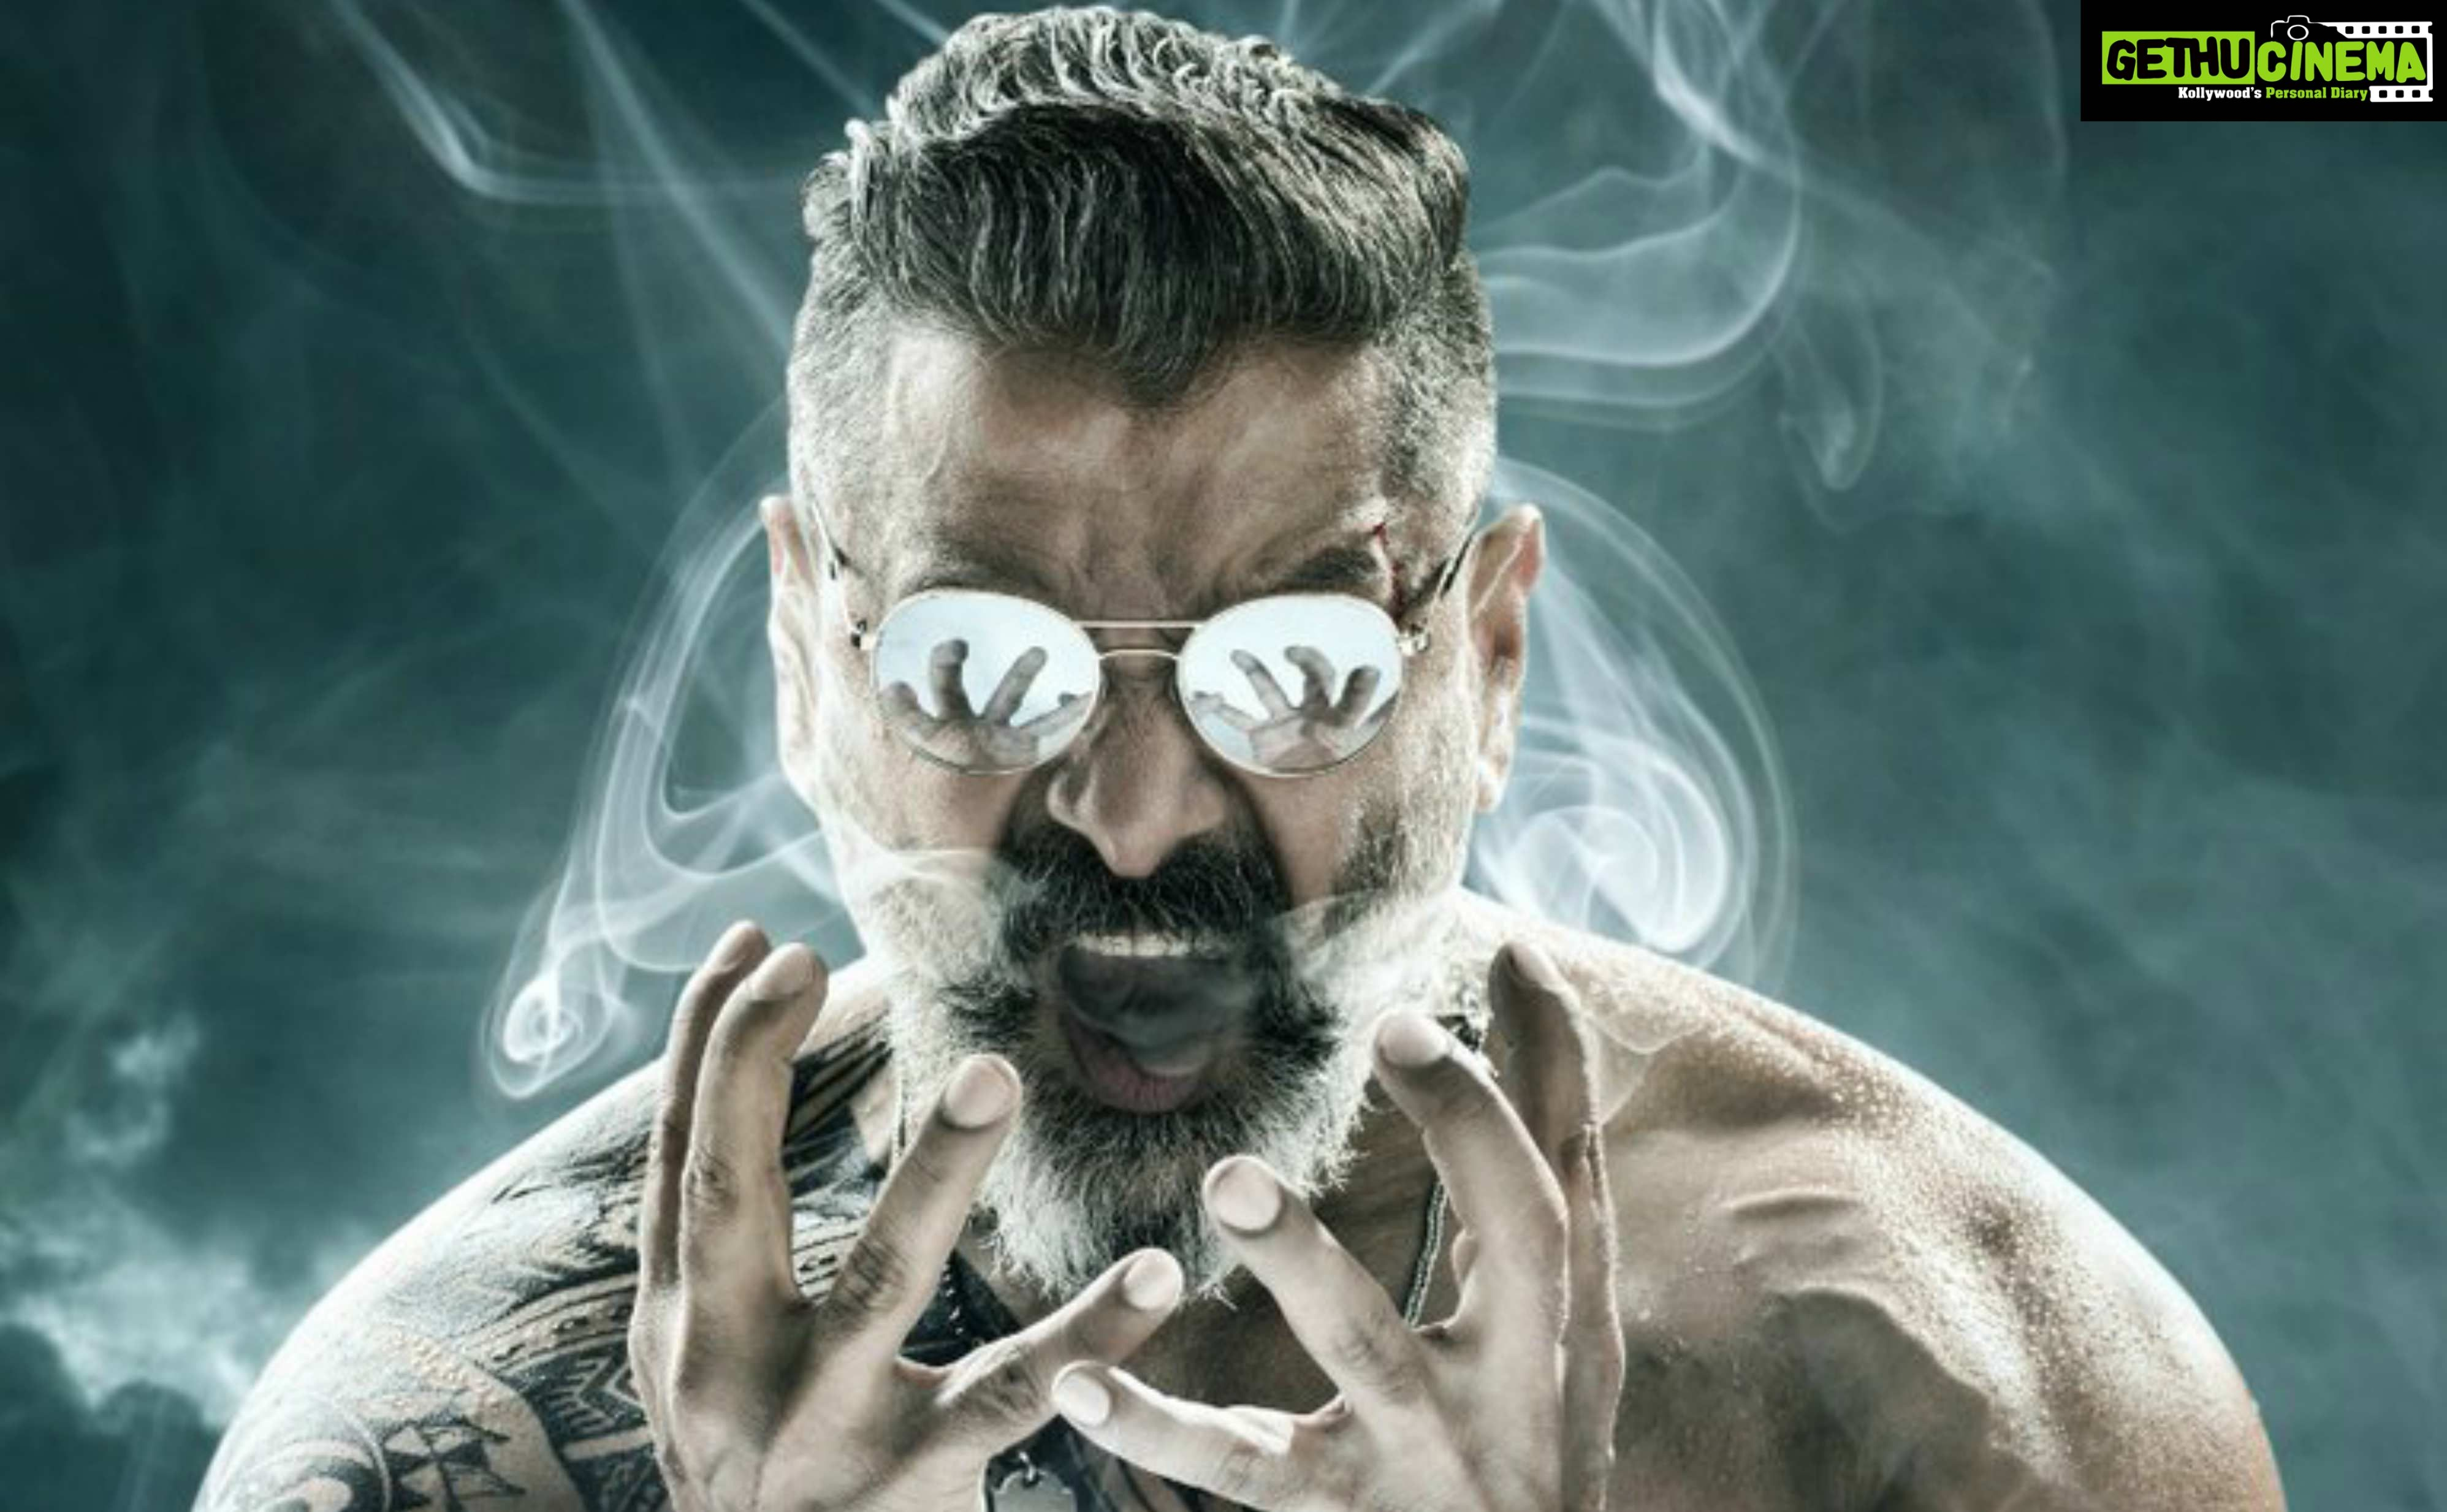 Kadaram Kondan Tamil Movie First Look Poster Chiyan 65 Vikram Gethu Cinema Hd Photos Actors Images Movies